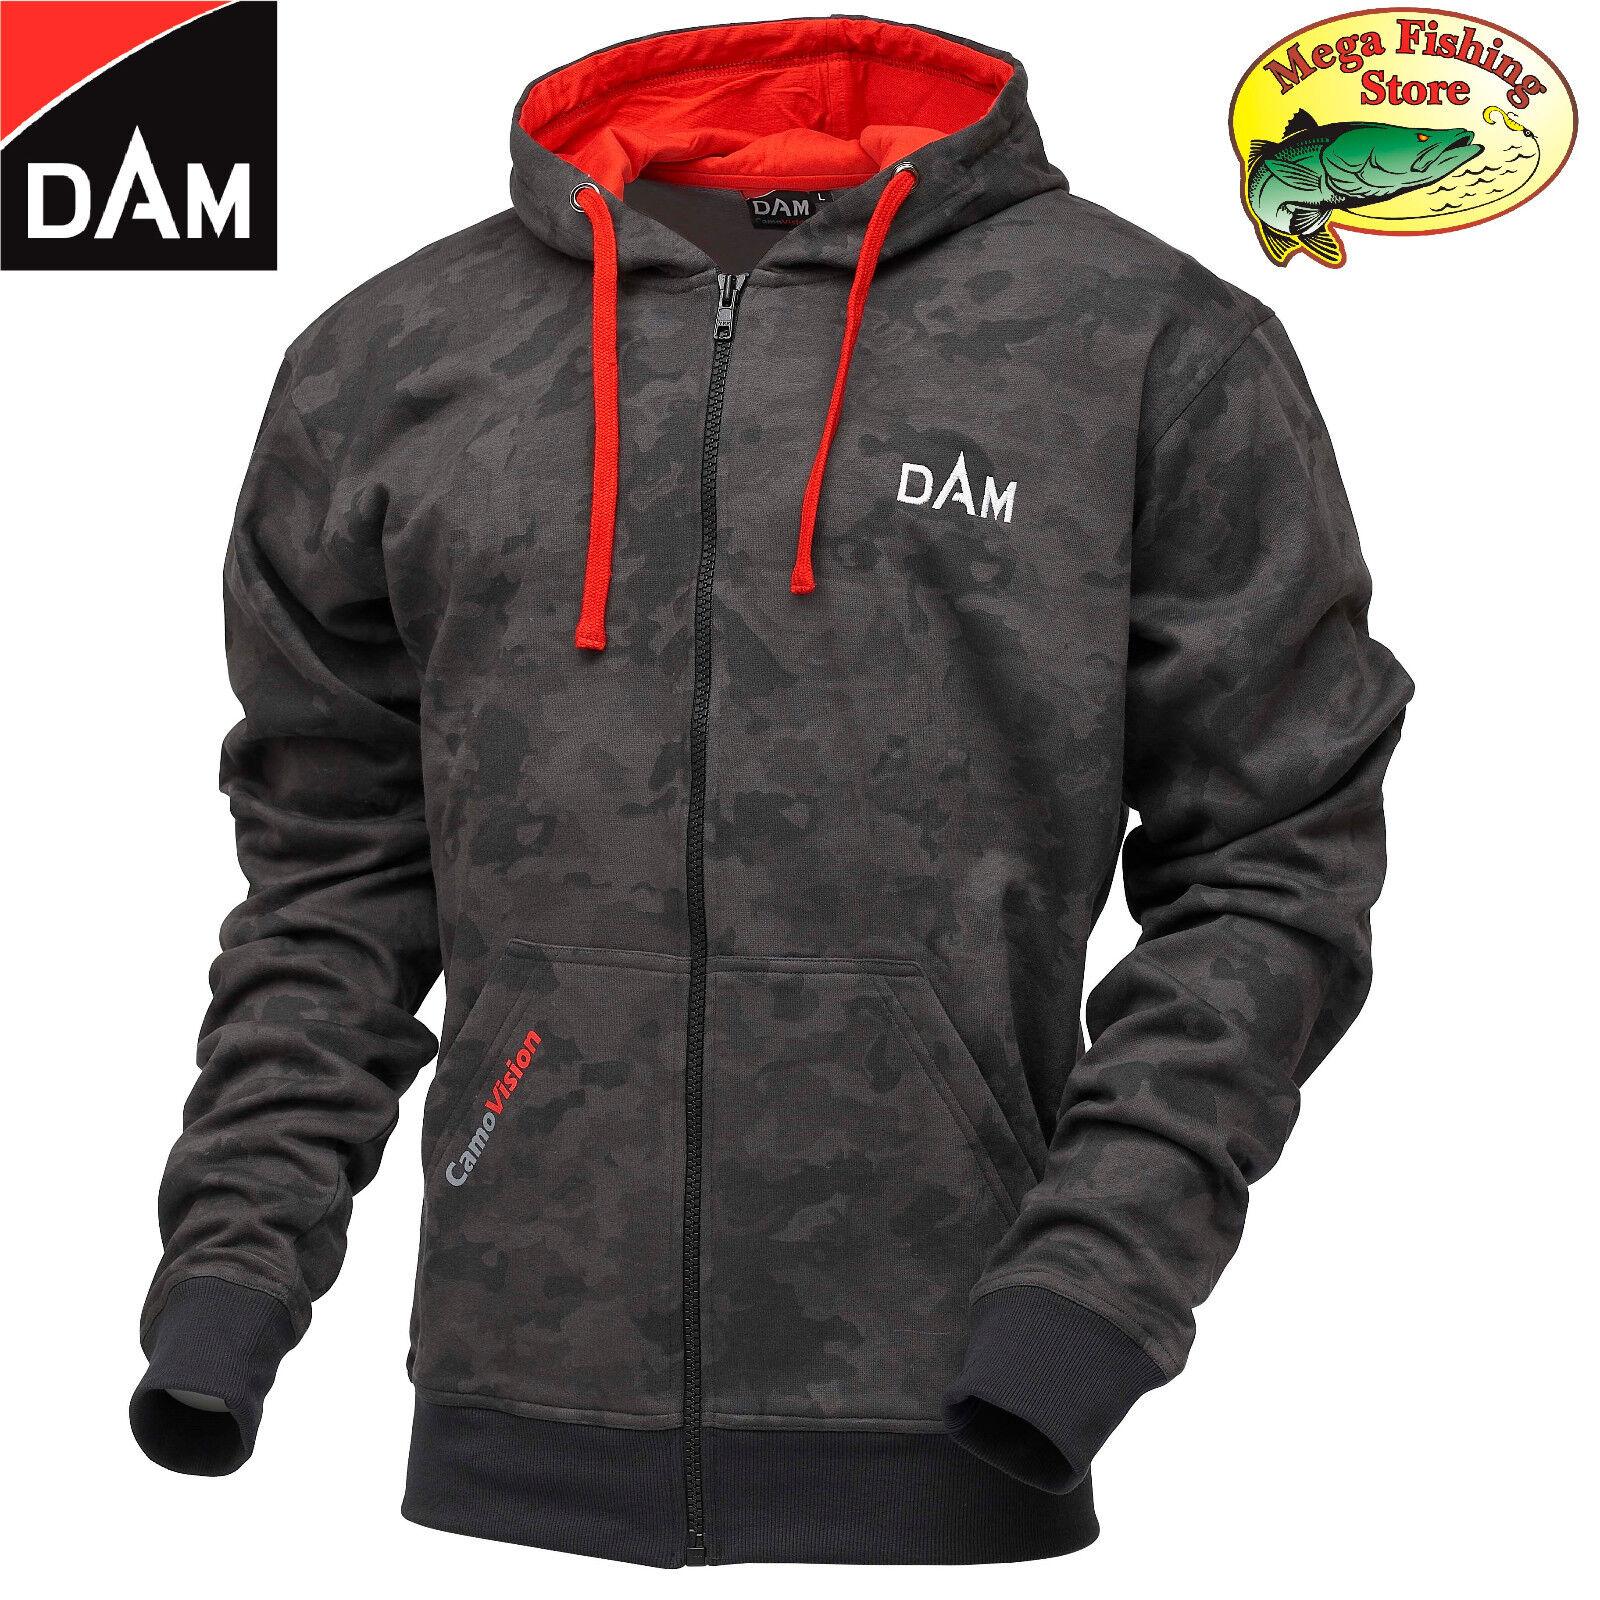 DAM Camovision Zip Hoody - Pullover Angel Jacke - Kapuzenpullover Hoodie M - XXL